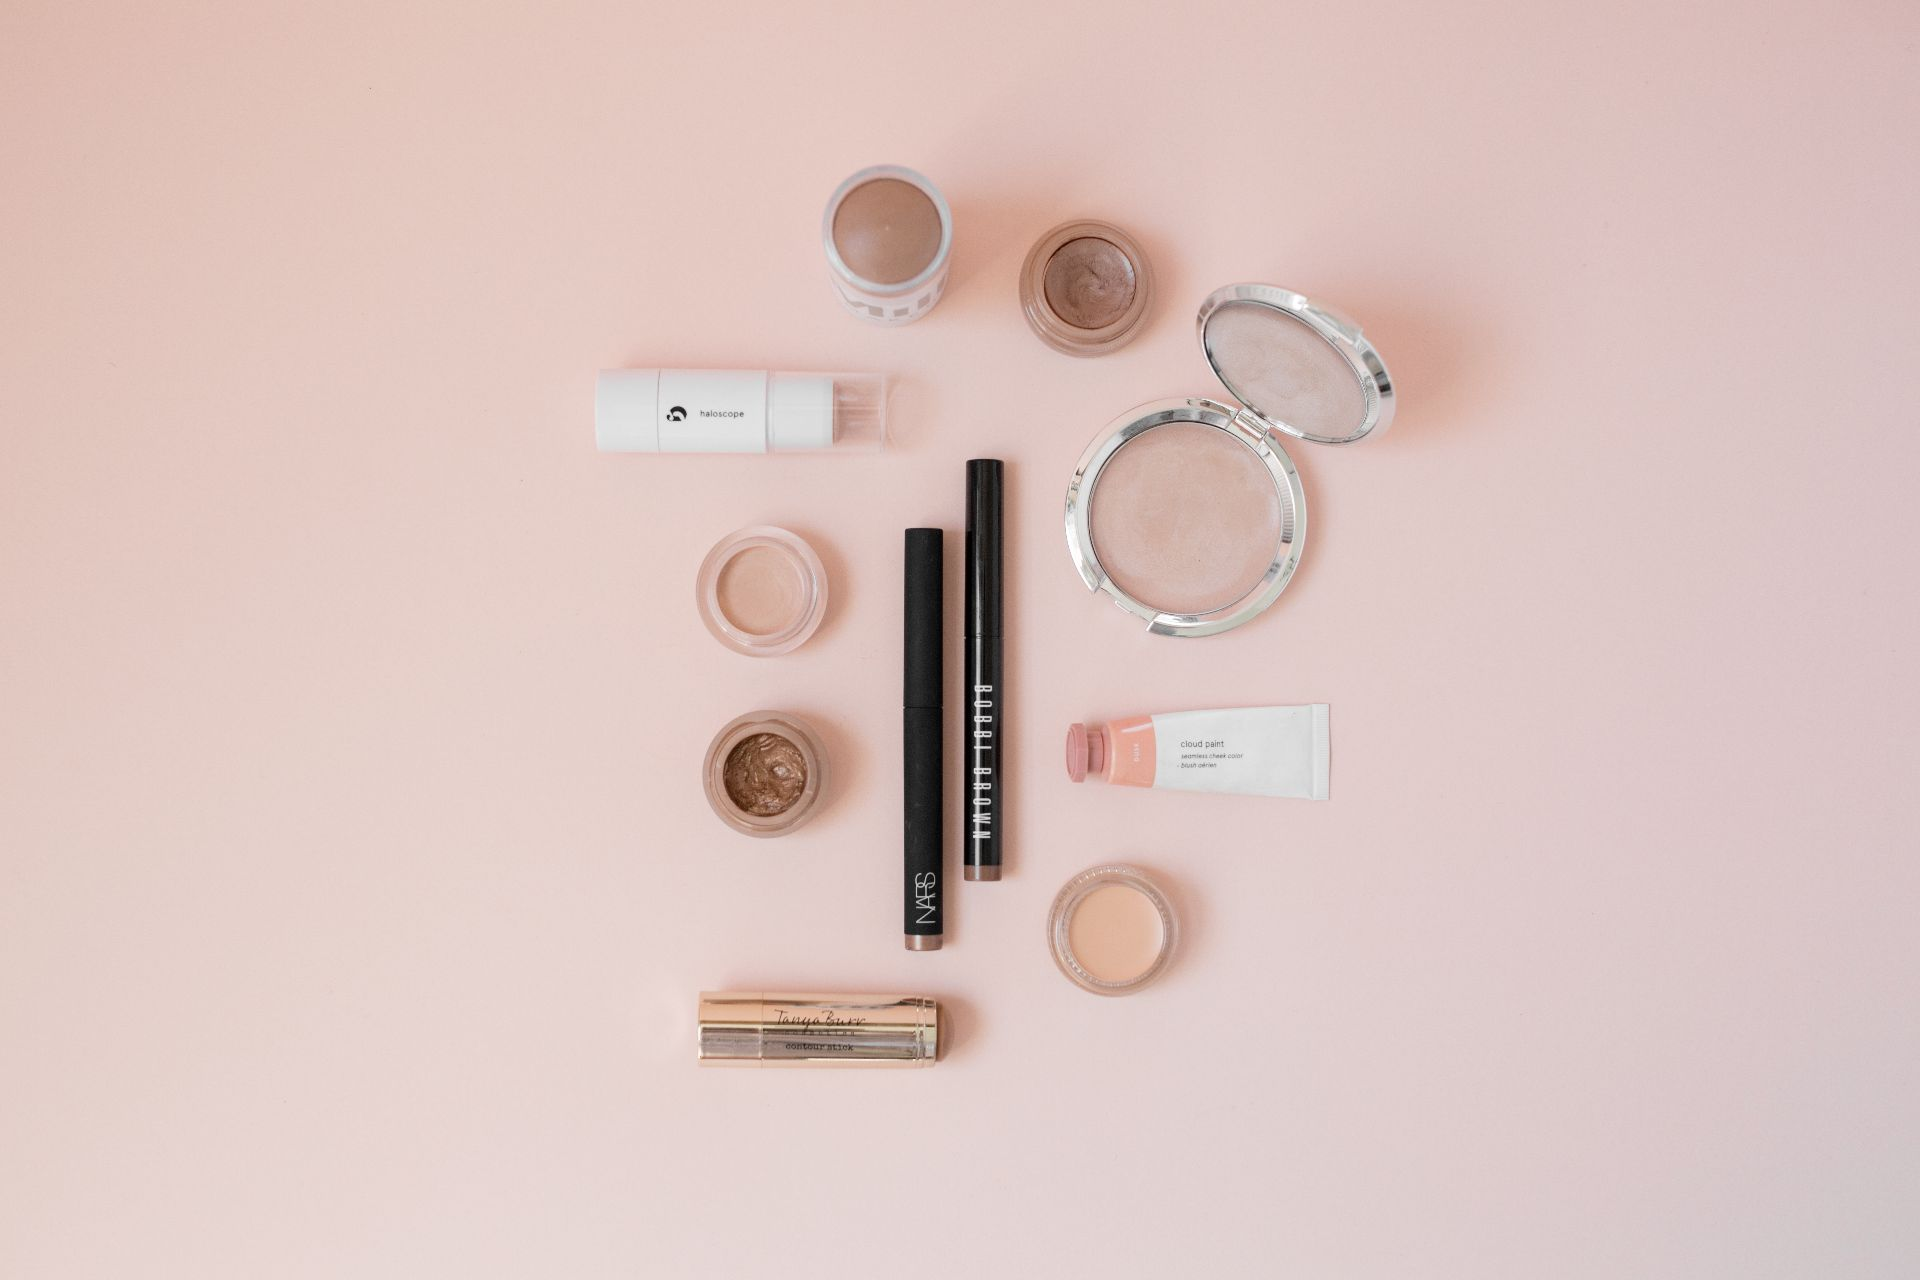 theannaedit-summer-creamy-makeup-beauty-picks-tanya-burr-bobbi-brown-itcosmetics-swatches-july-2017-1